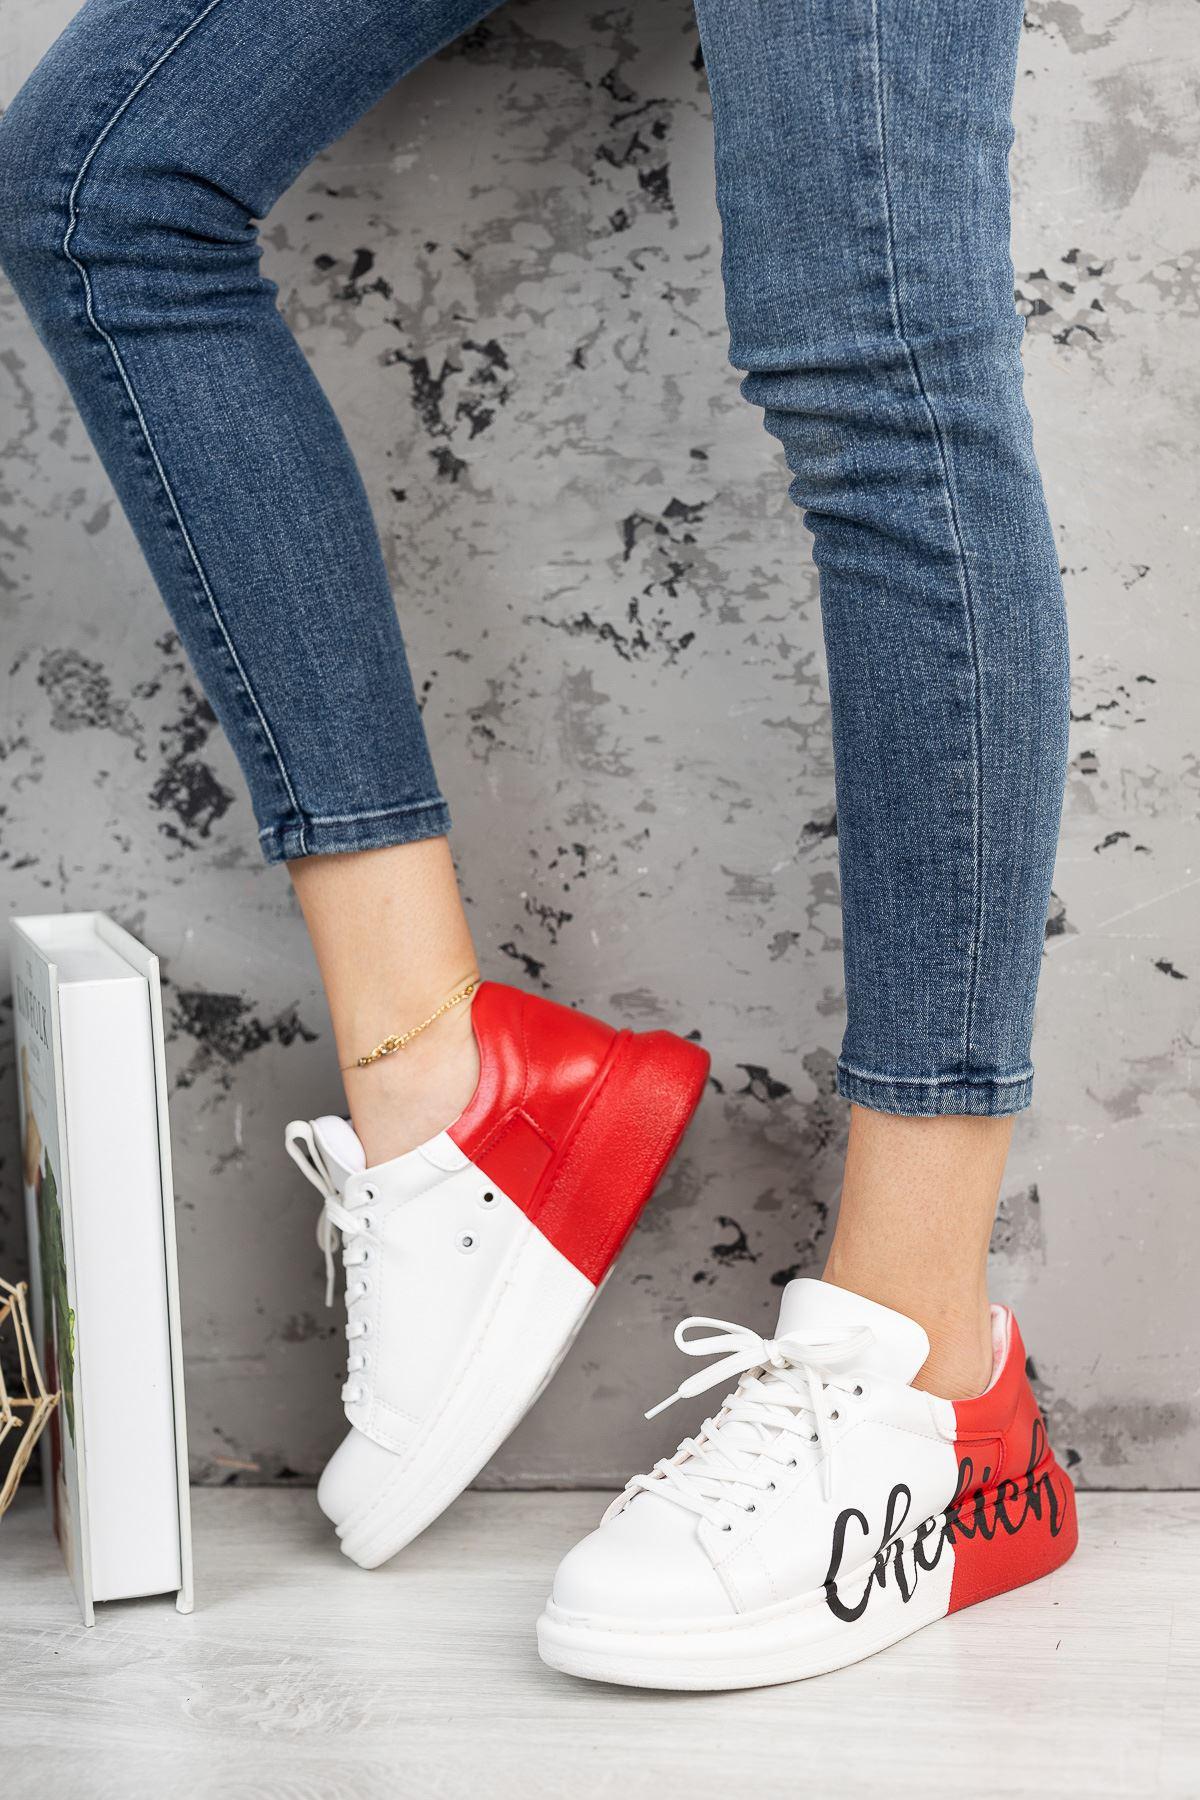 Chekich CH254 BT Kadın Ayakkabı 427 BEYAZ KIRMIZI CHEKICH